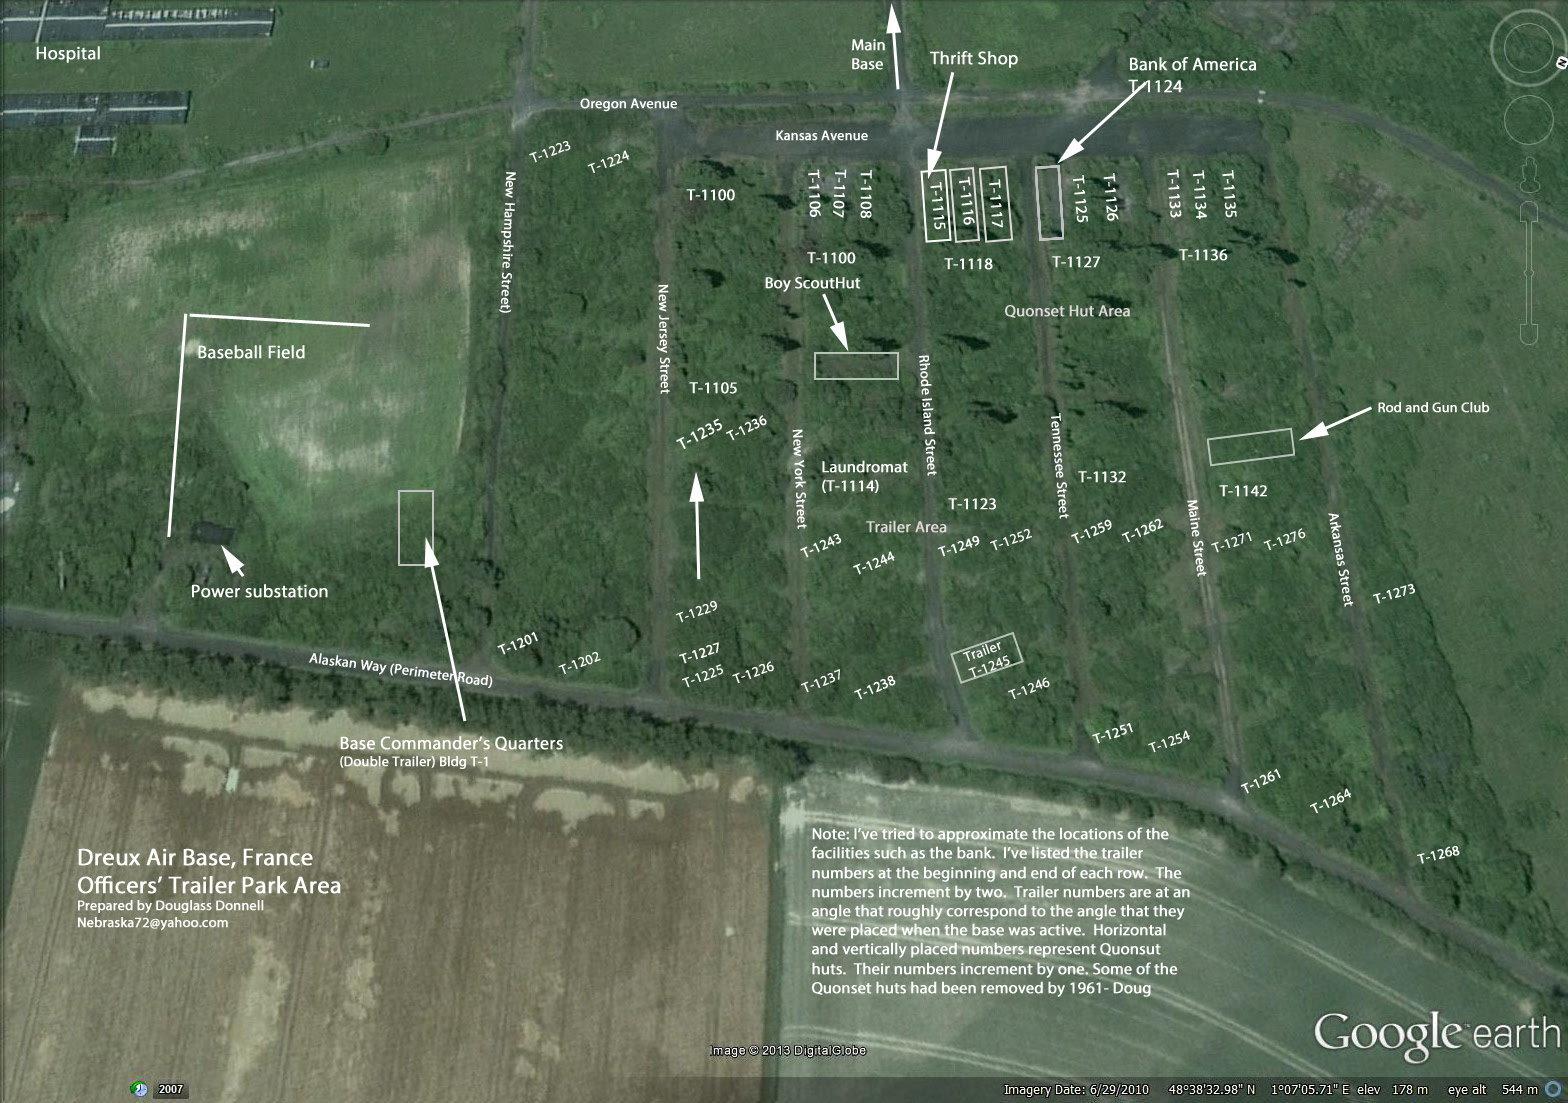 Dreux Air Base Maps And Sketches Dreux Air Base France